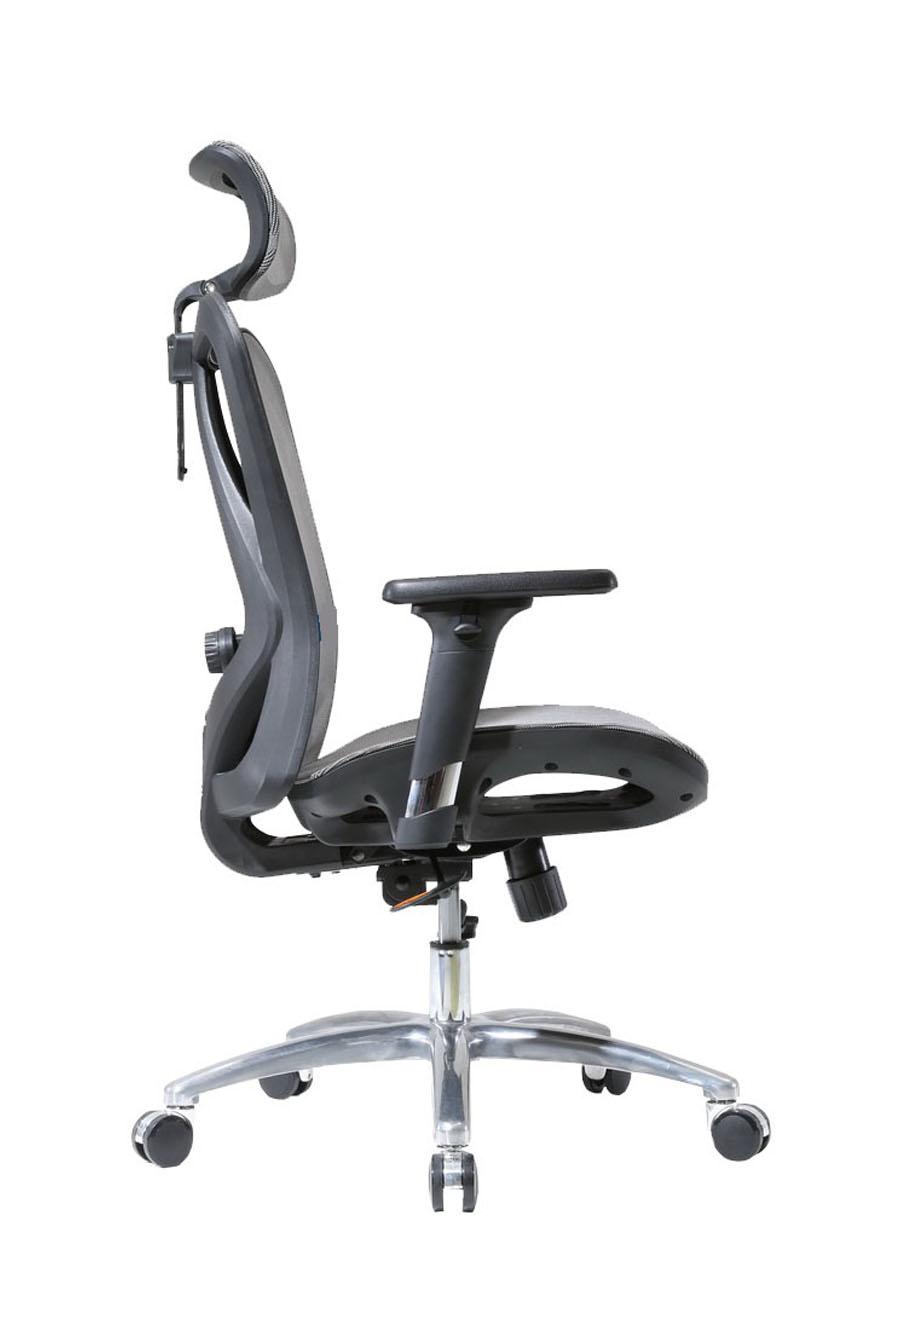 KB-1_人體工學椅_電腦椅_黑框黑網_側面照片